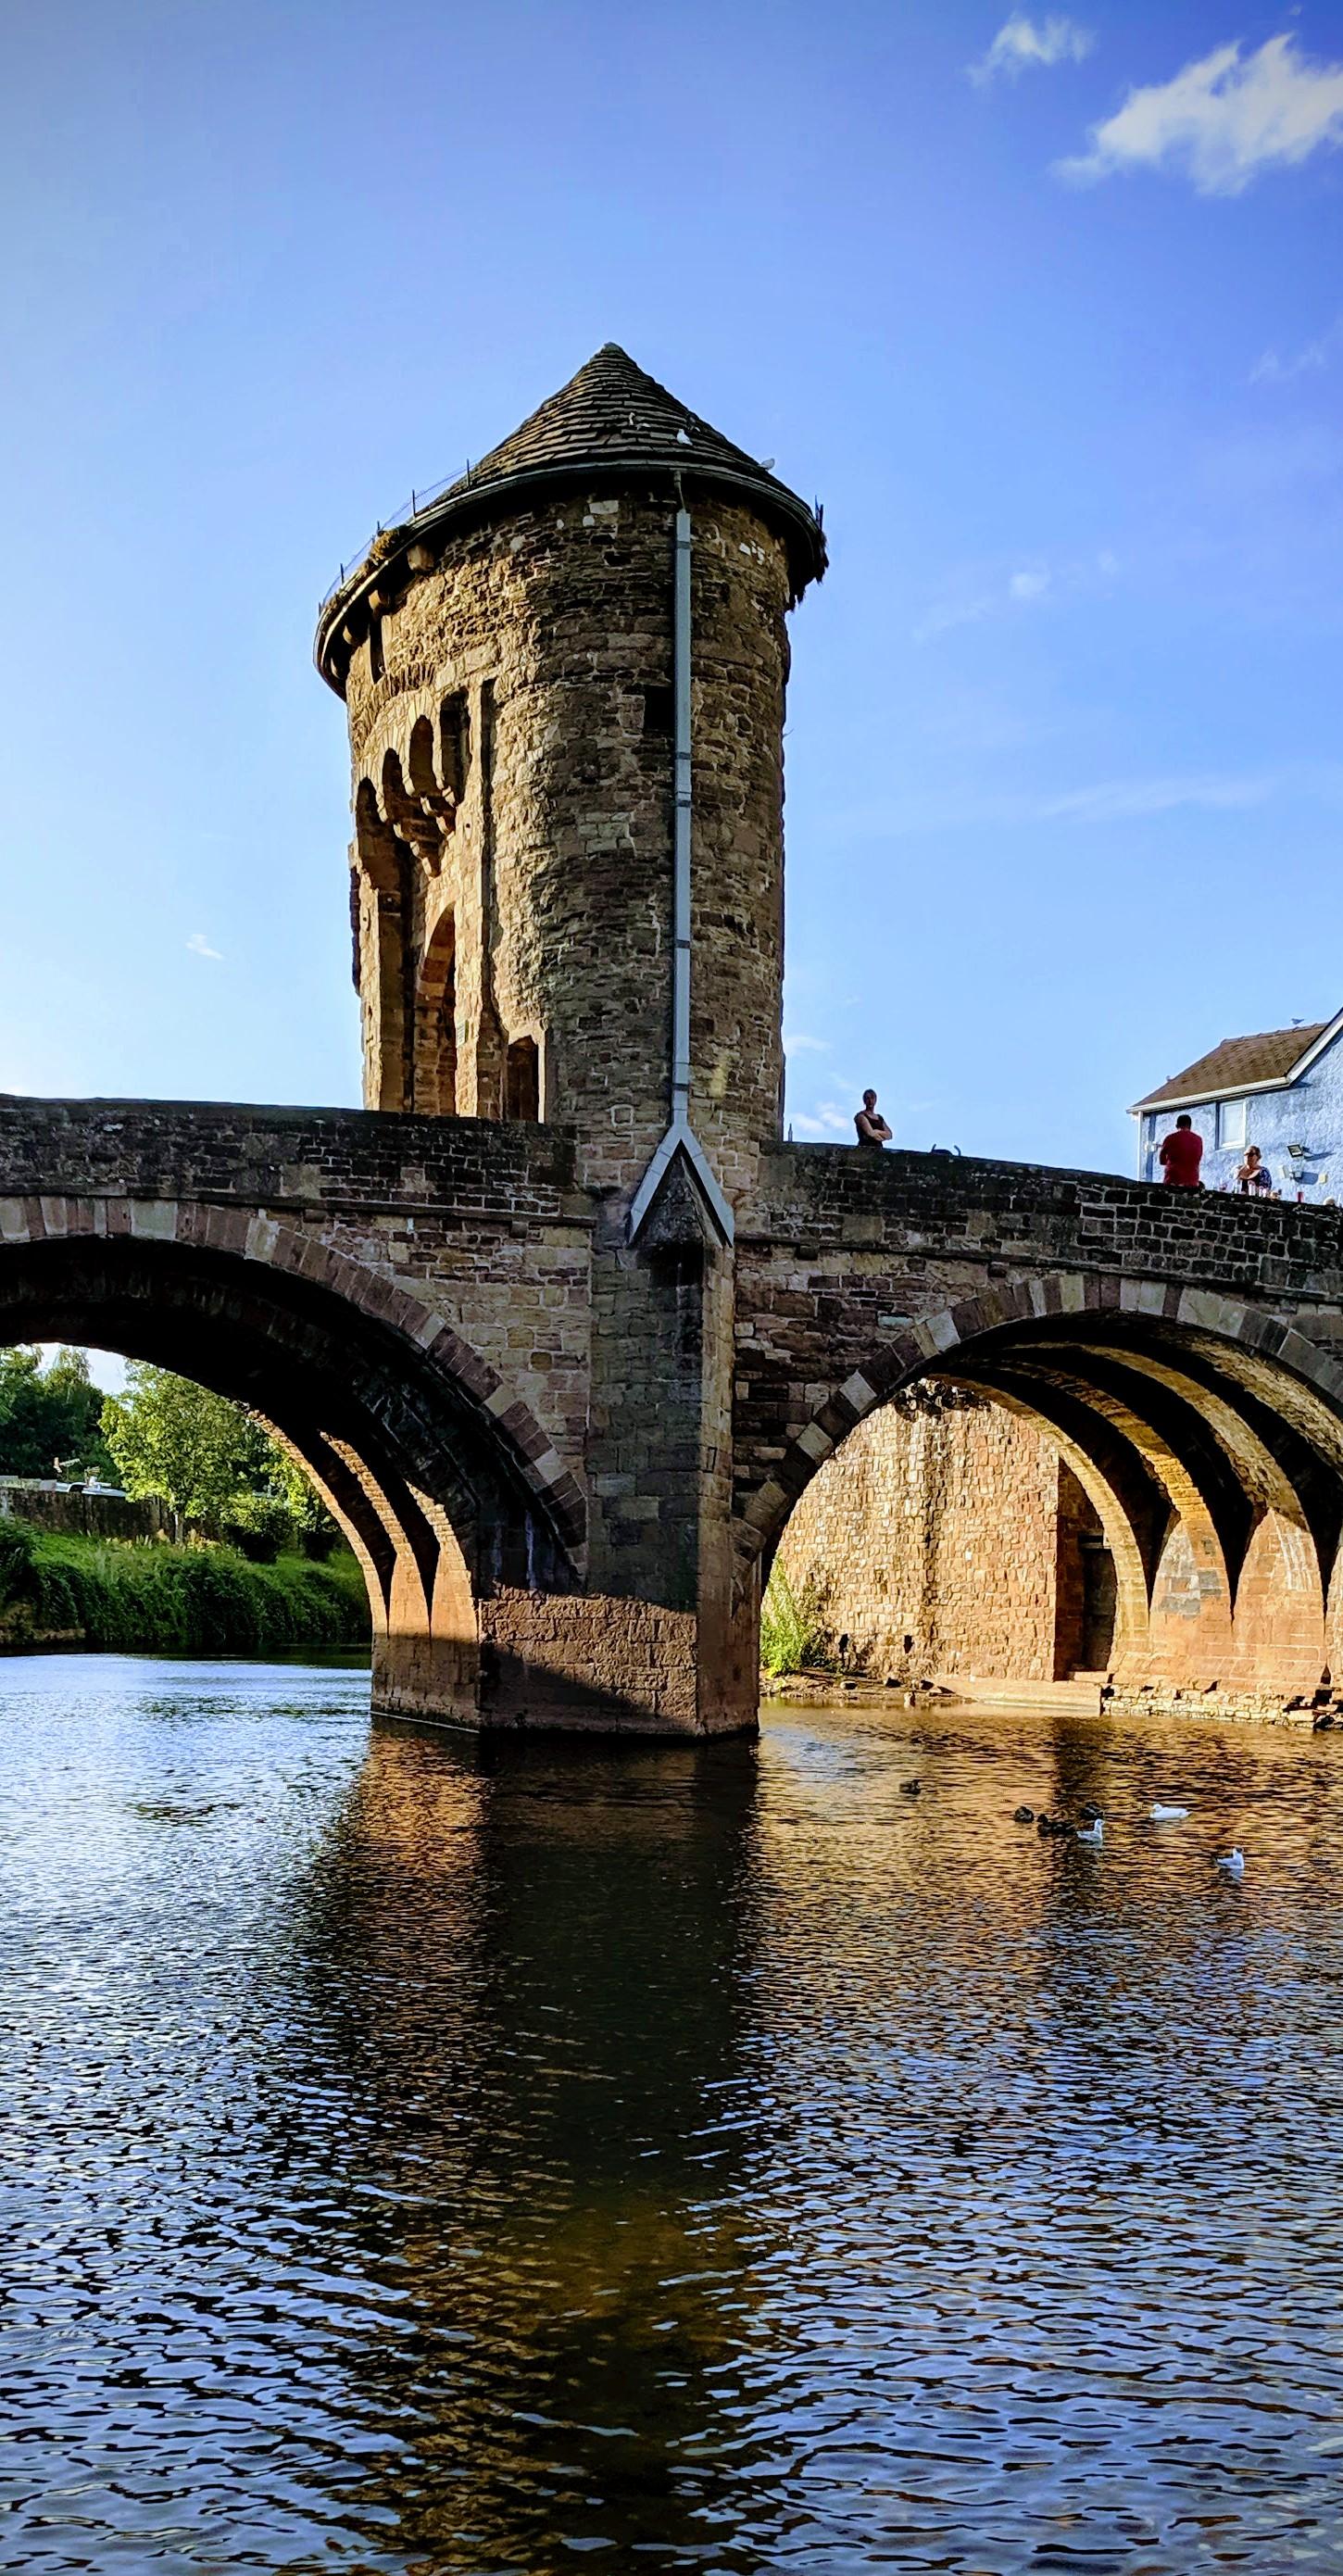 Monnow Bridge, Monmouth (Wales, UK)